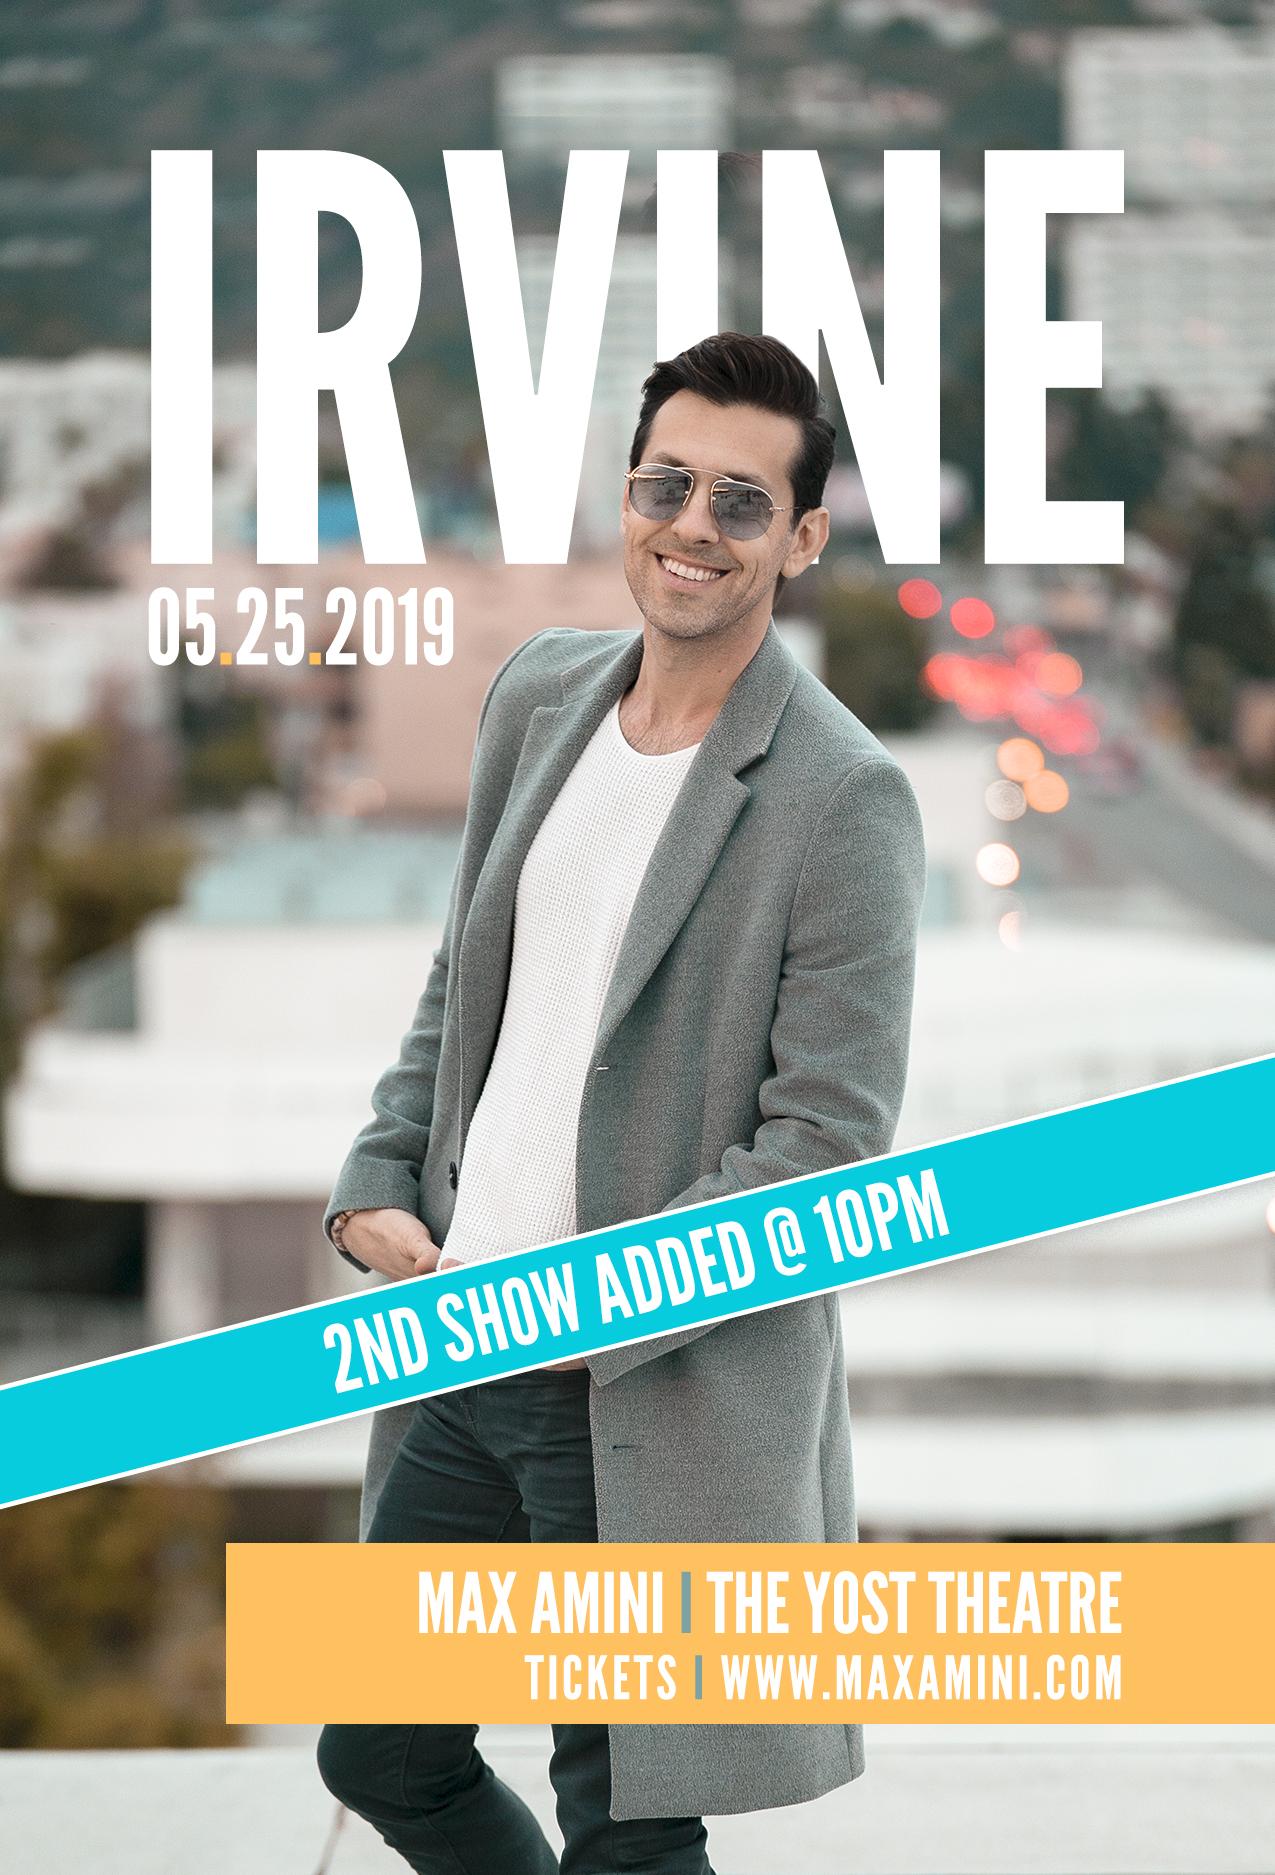 Irvine_4x6_2nd_show_1.jpg